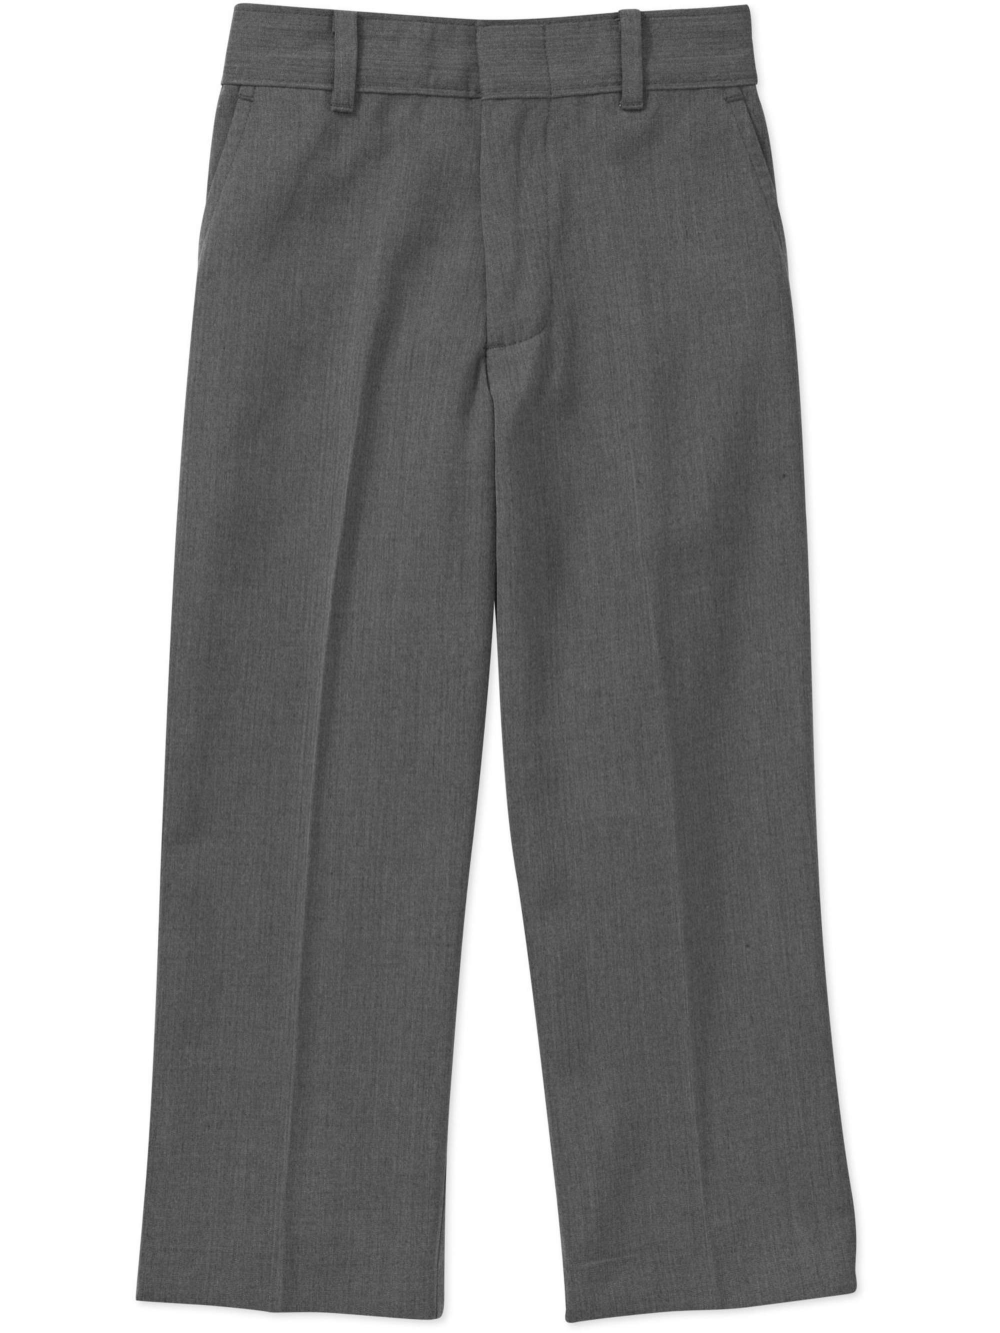 George George Boys Dress Pants Sizes 4 7 Walmart Com Boys Dress Pants Dress Pants Fun Pants [ 1333 x 1000 Pixel ]